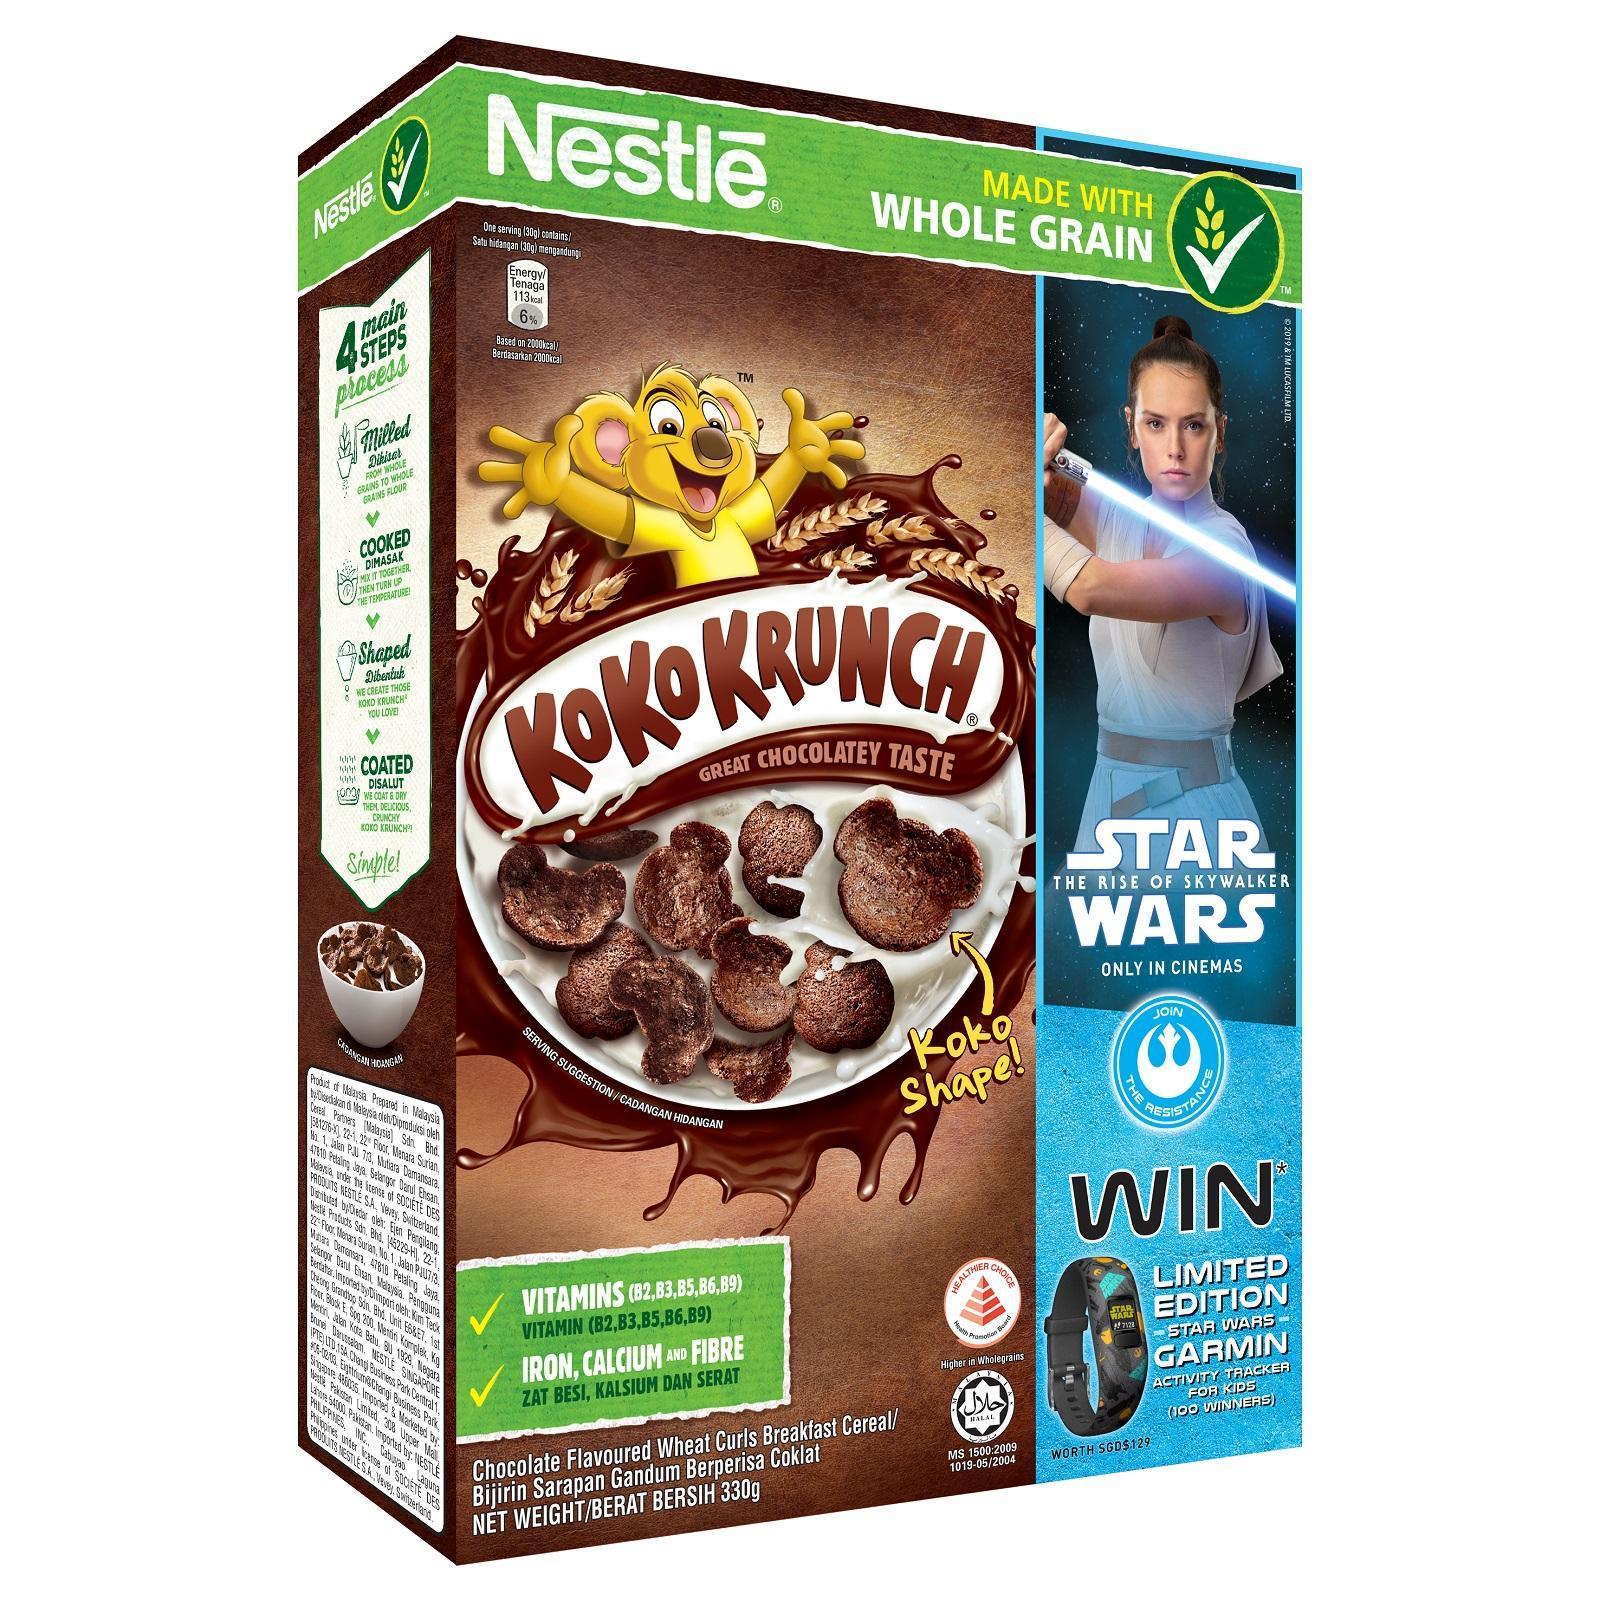 Nestle KoKo Krunch Cereal Star Wars Promo